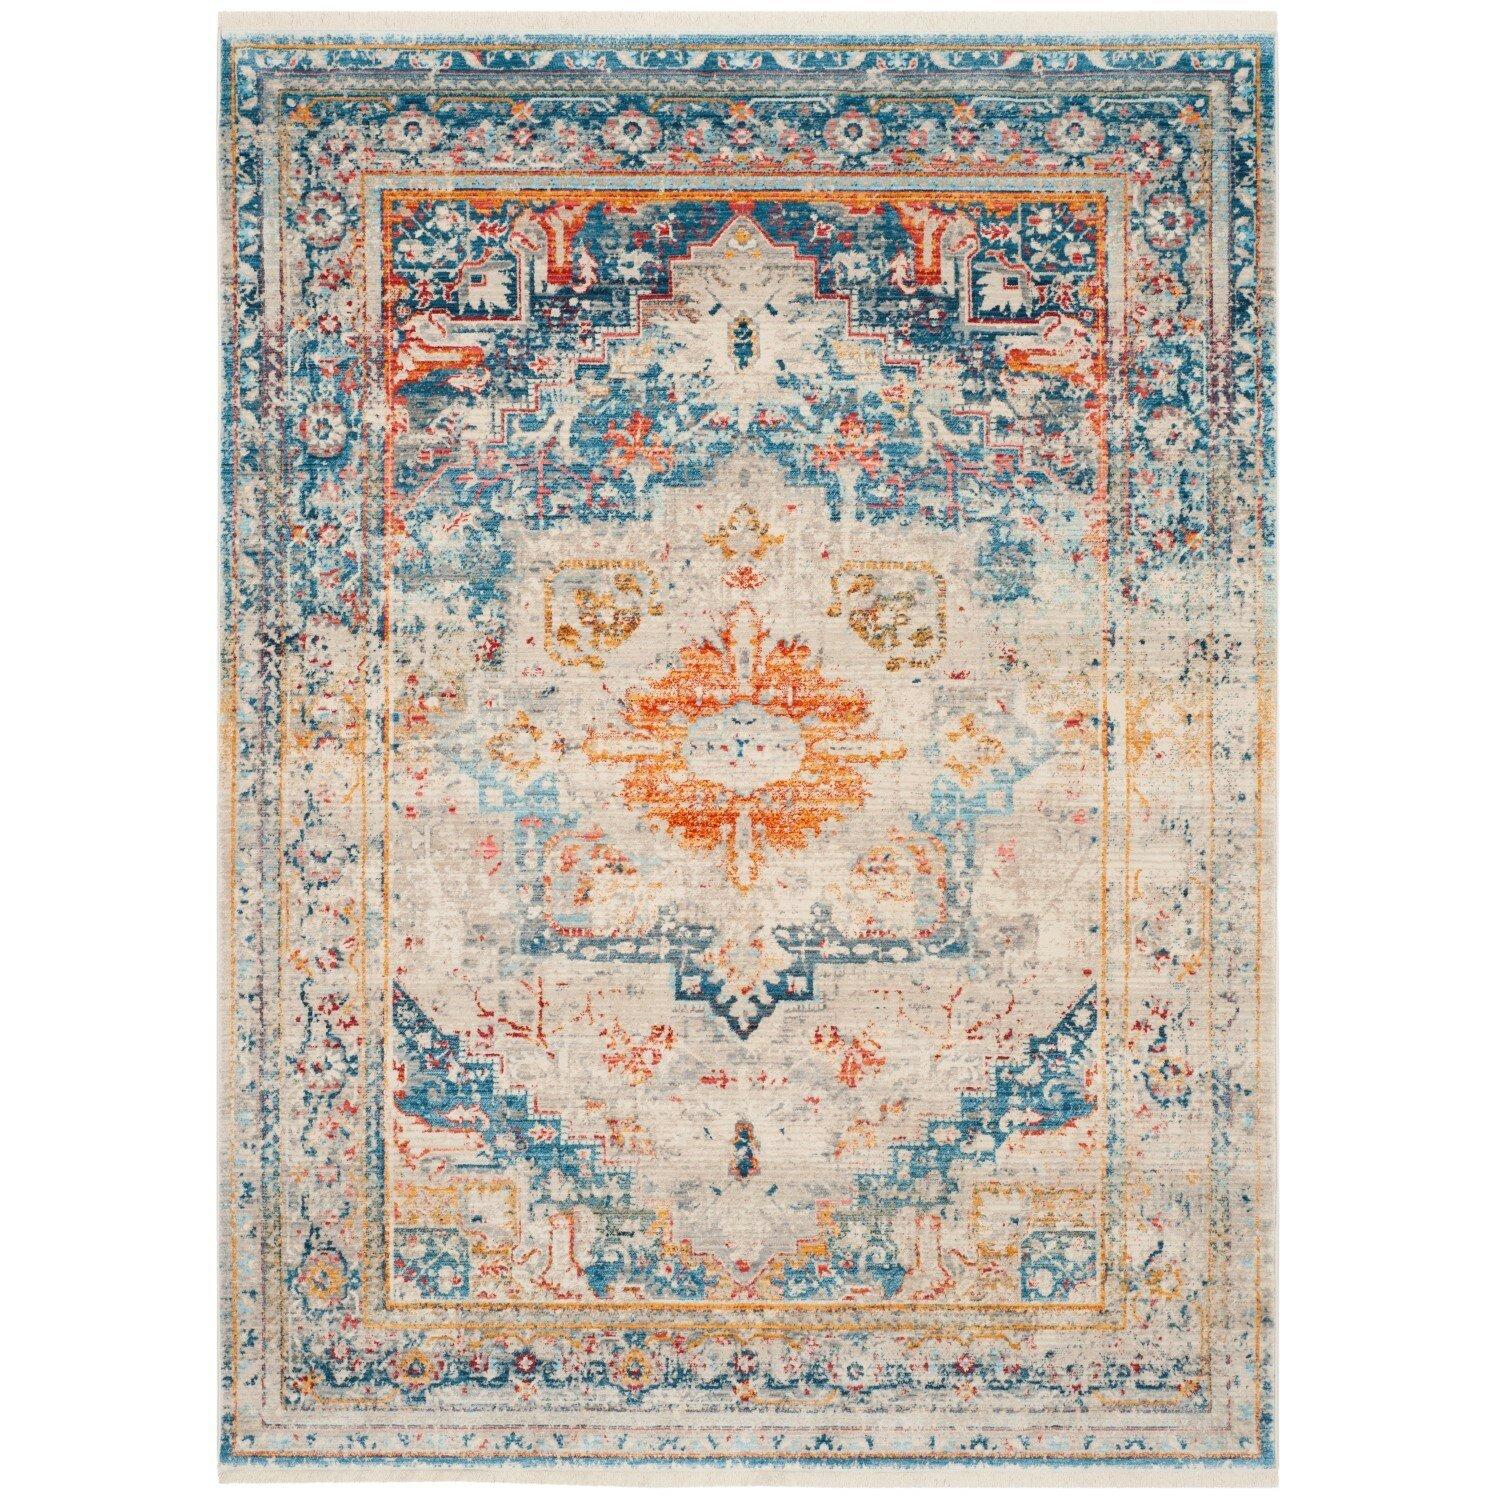 Throw Rugs On Wayfair: Vintage Persian Area Rug